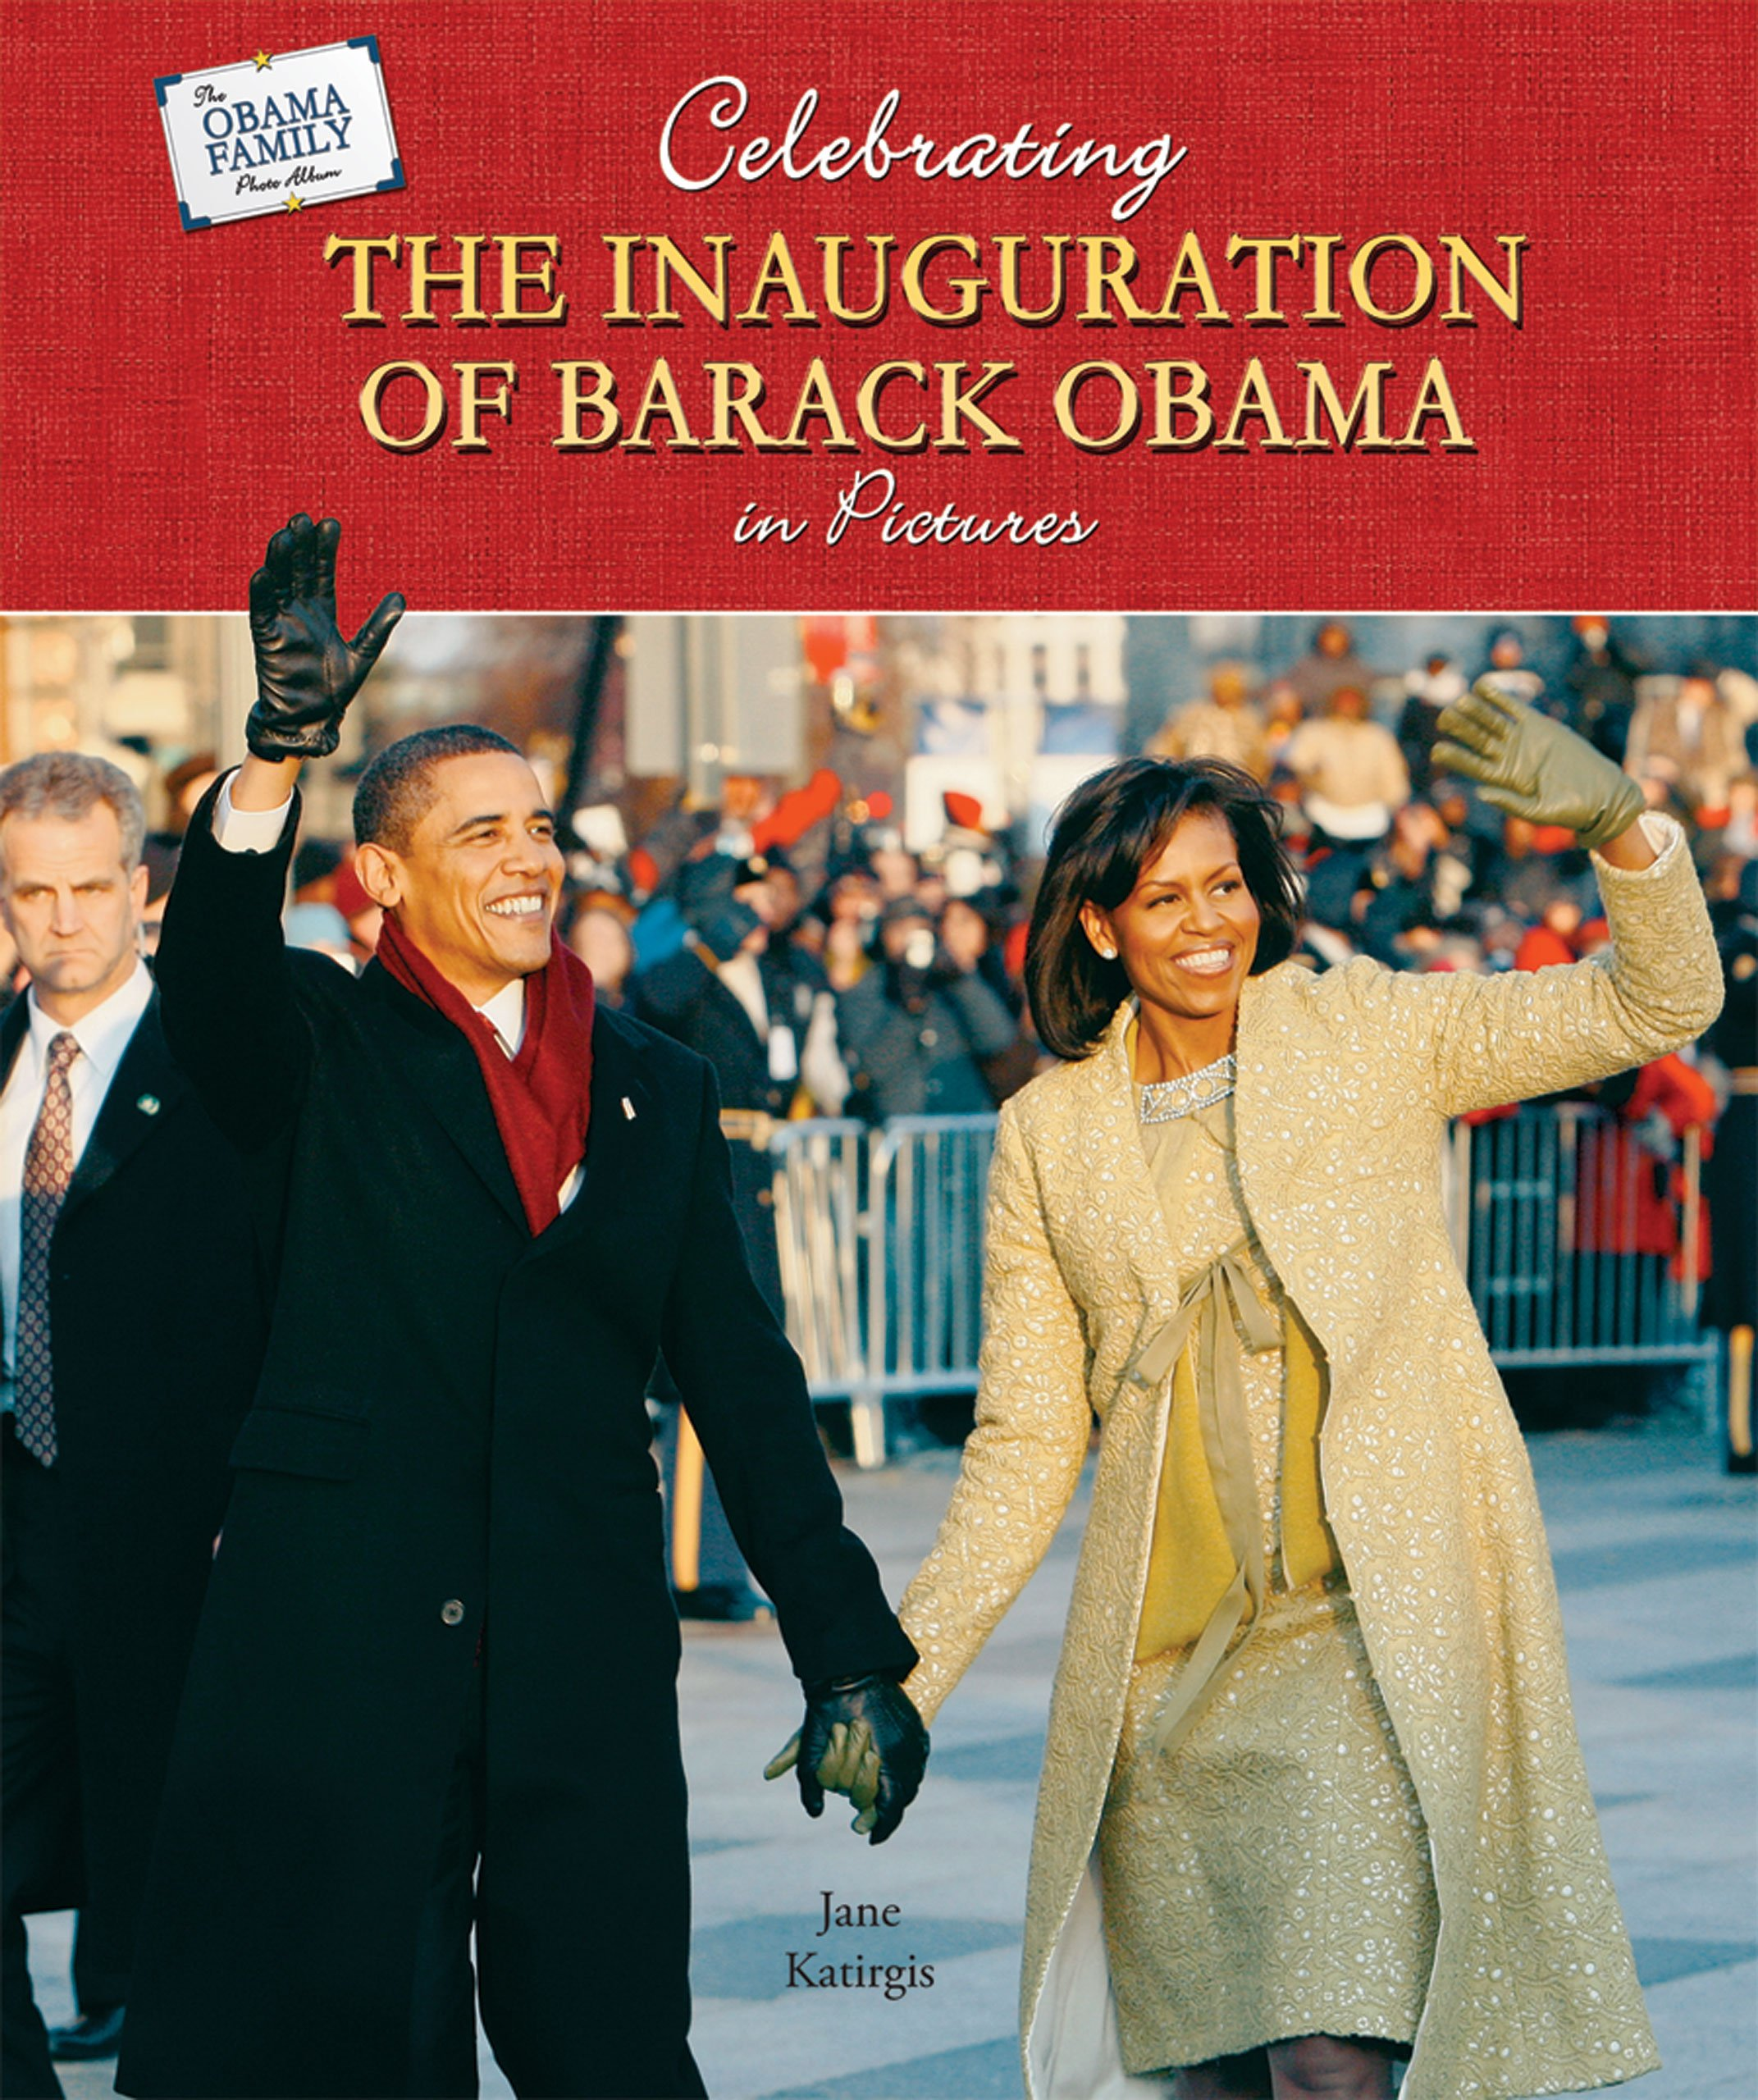 Celebrating the Inauguration of Barack Obama in Pictures (The Obama Family Photo Album) pdf epub